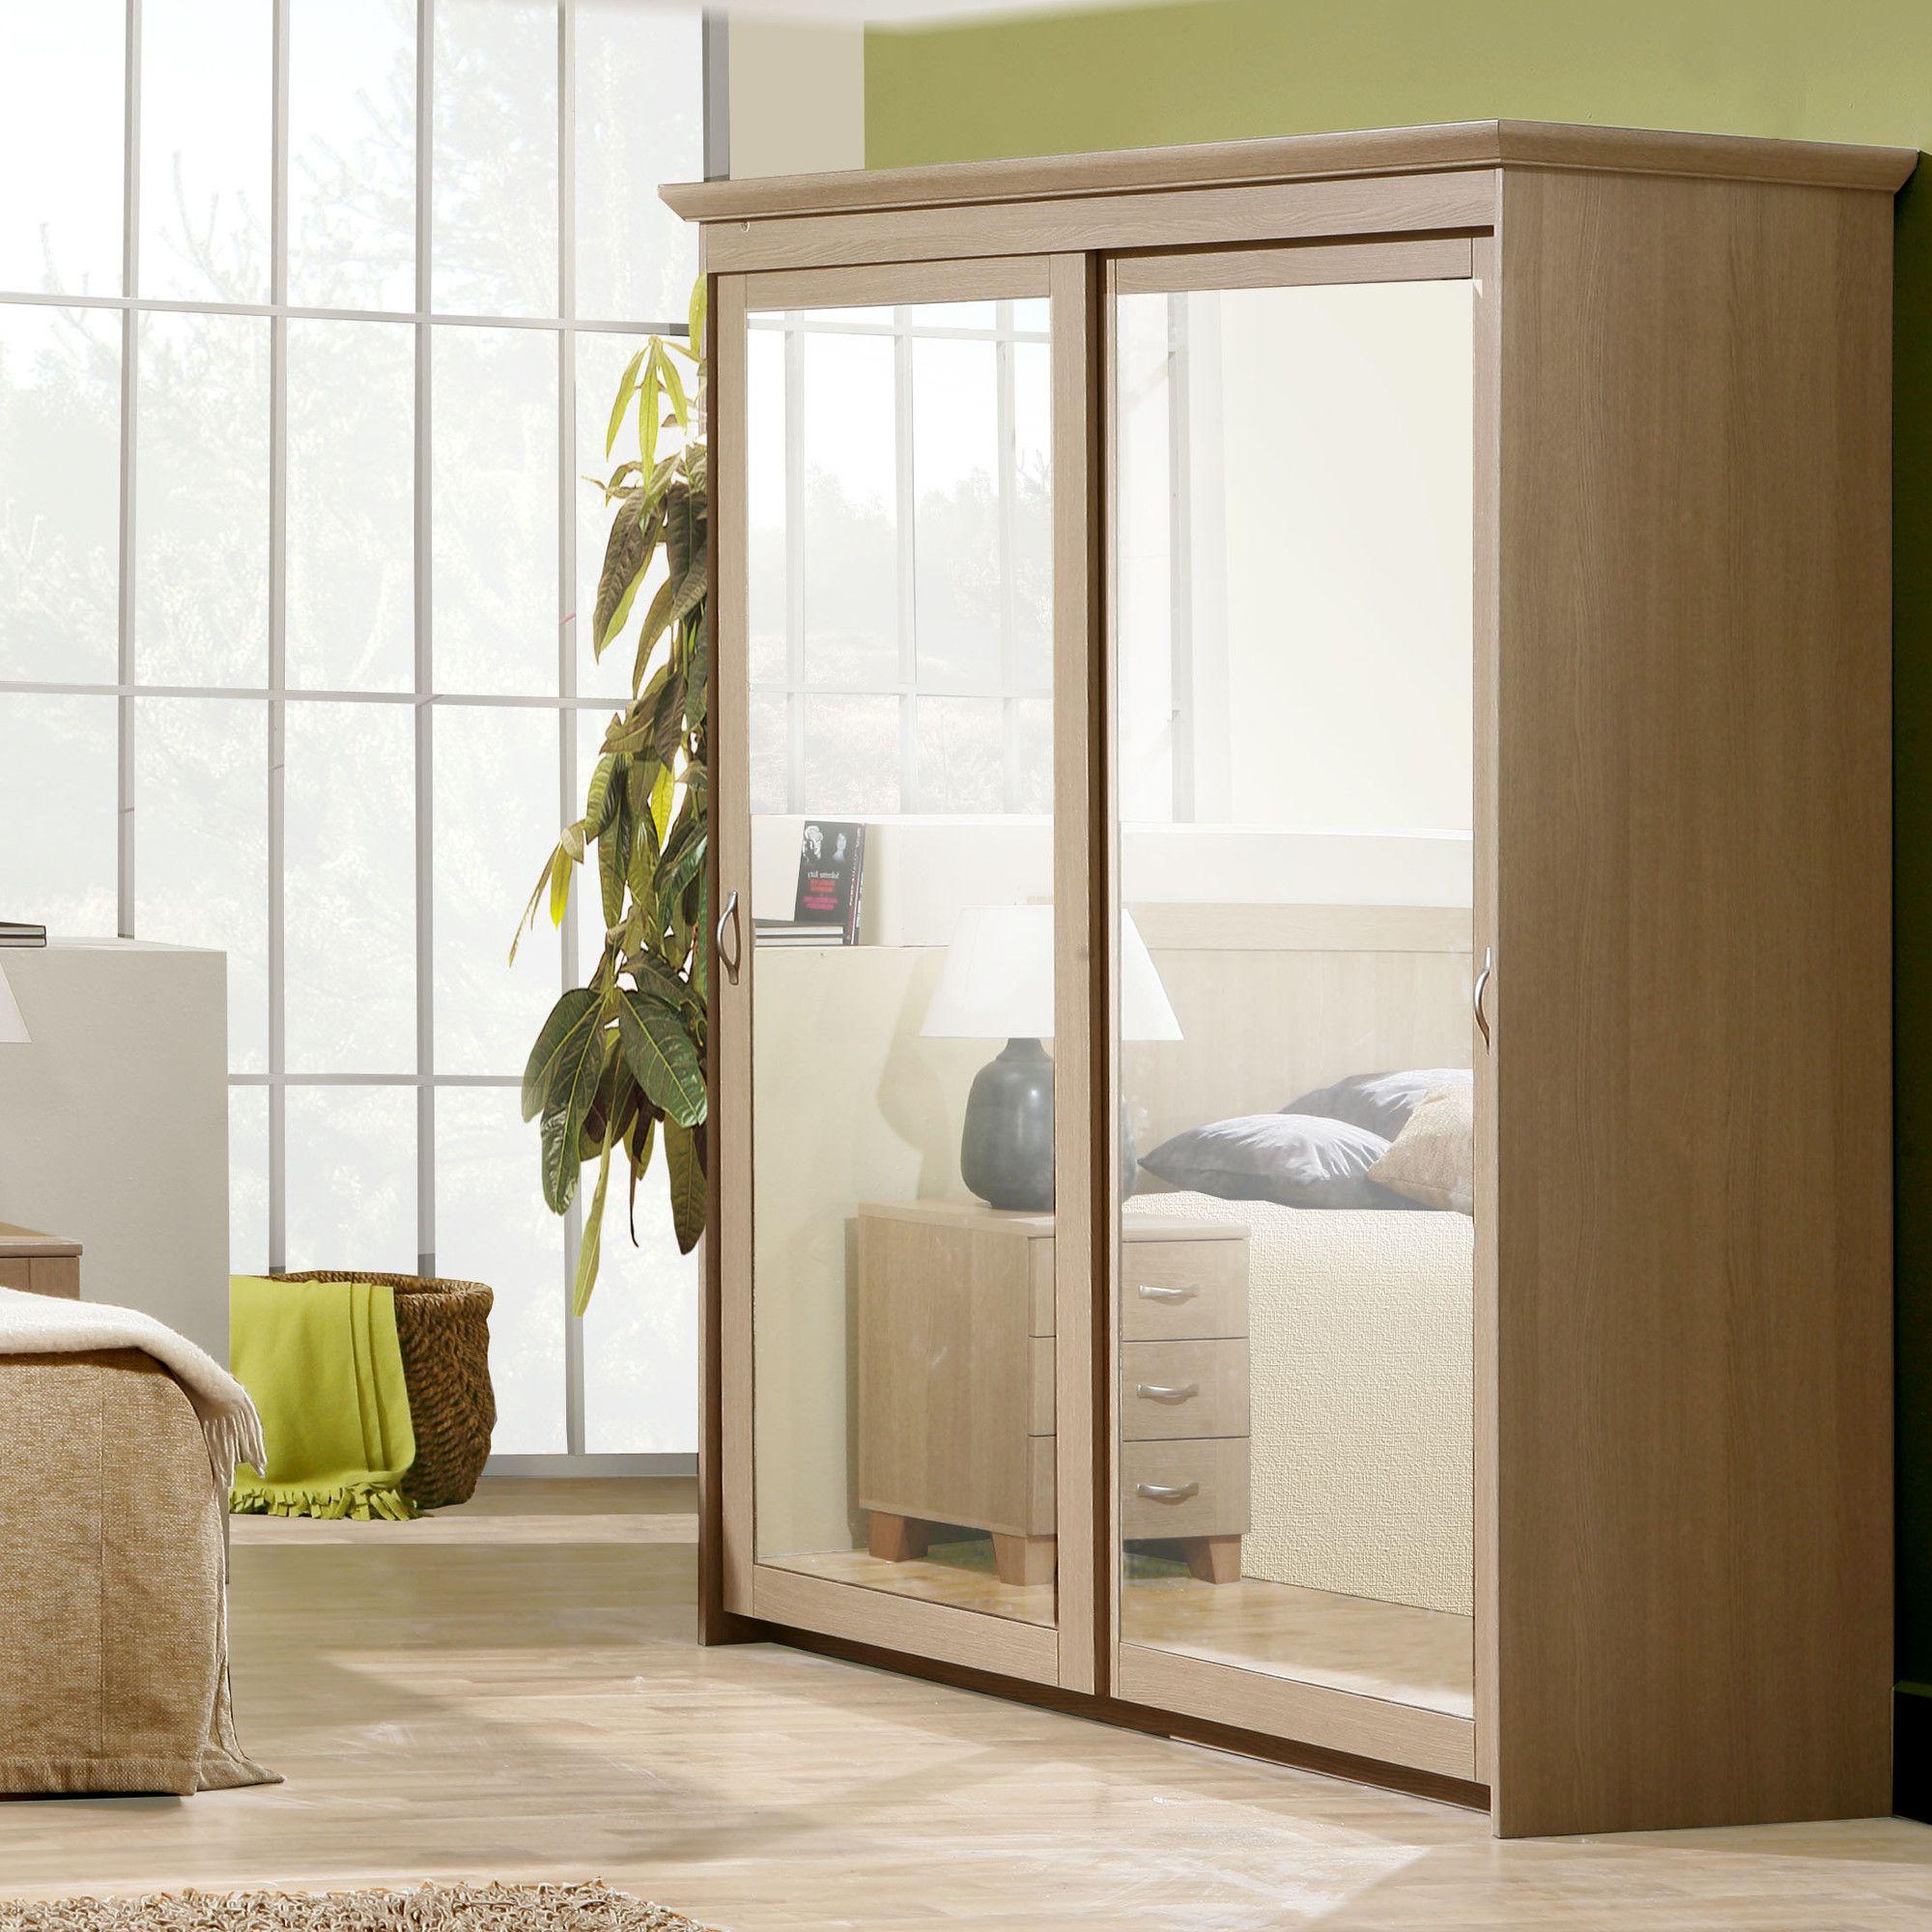 Ideal Furniture Rio Sliding Wardrobe in Yorkshire Oak at Tesco Direct